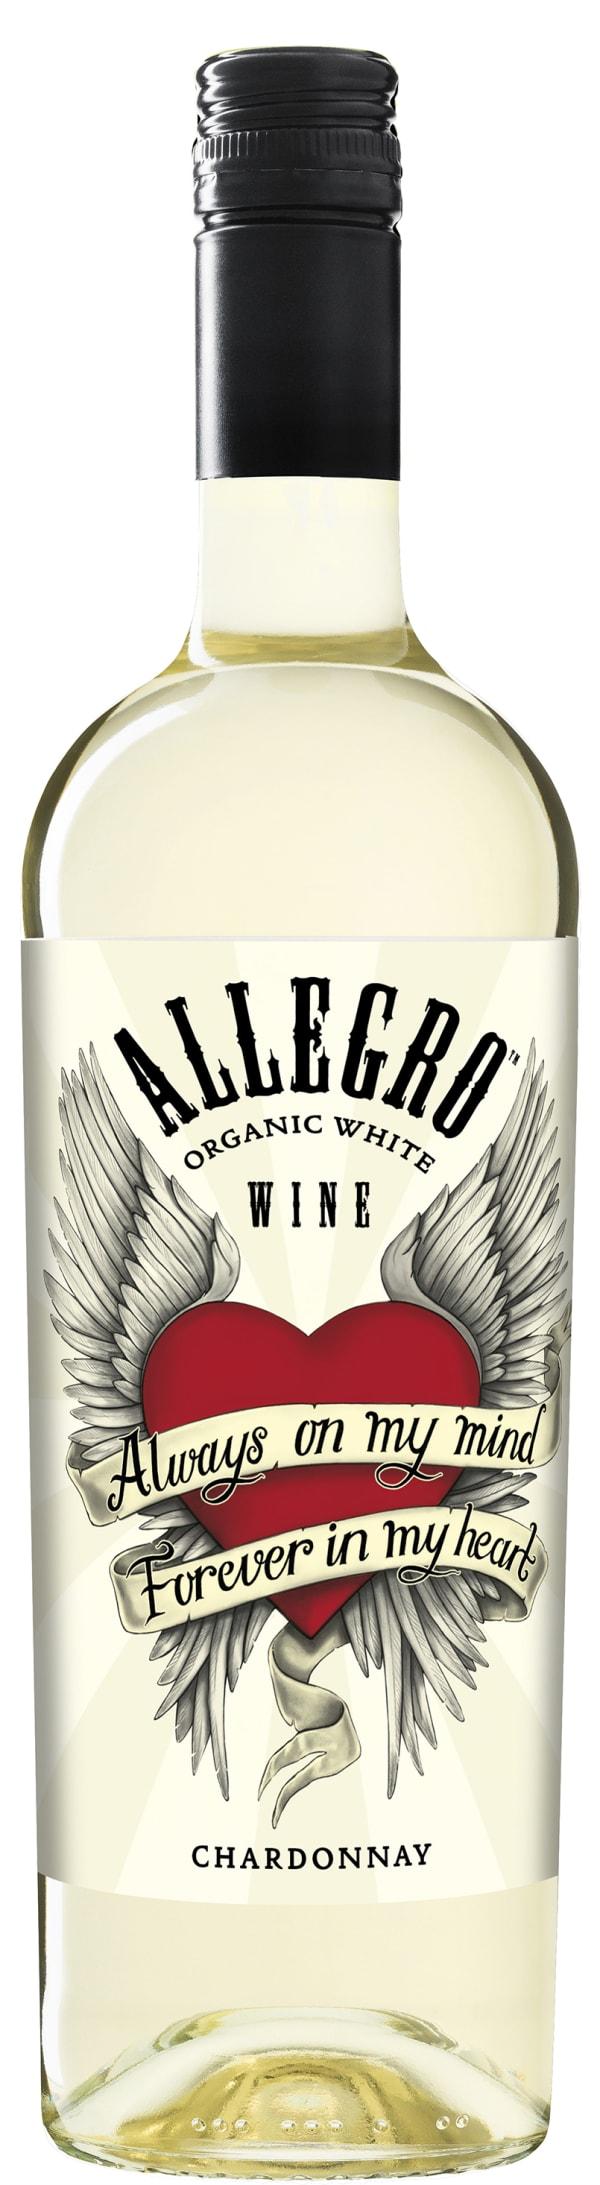 Allegro Organic Chardonnay 2016